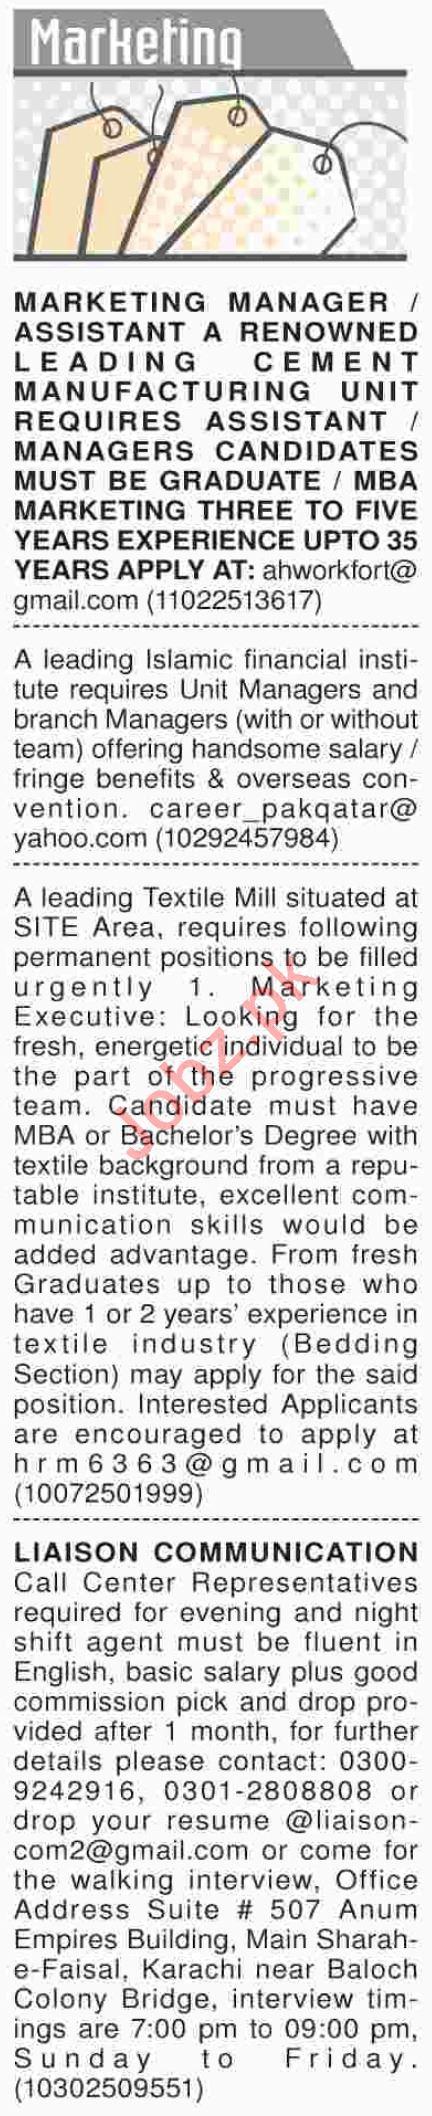 Dawn Newspaper Sunday Marketing Classified Ads 2/12/2018